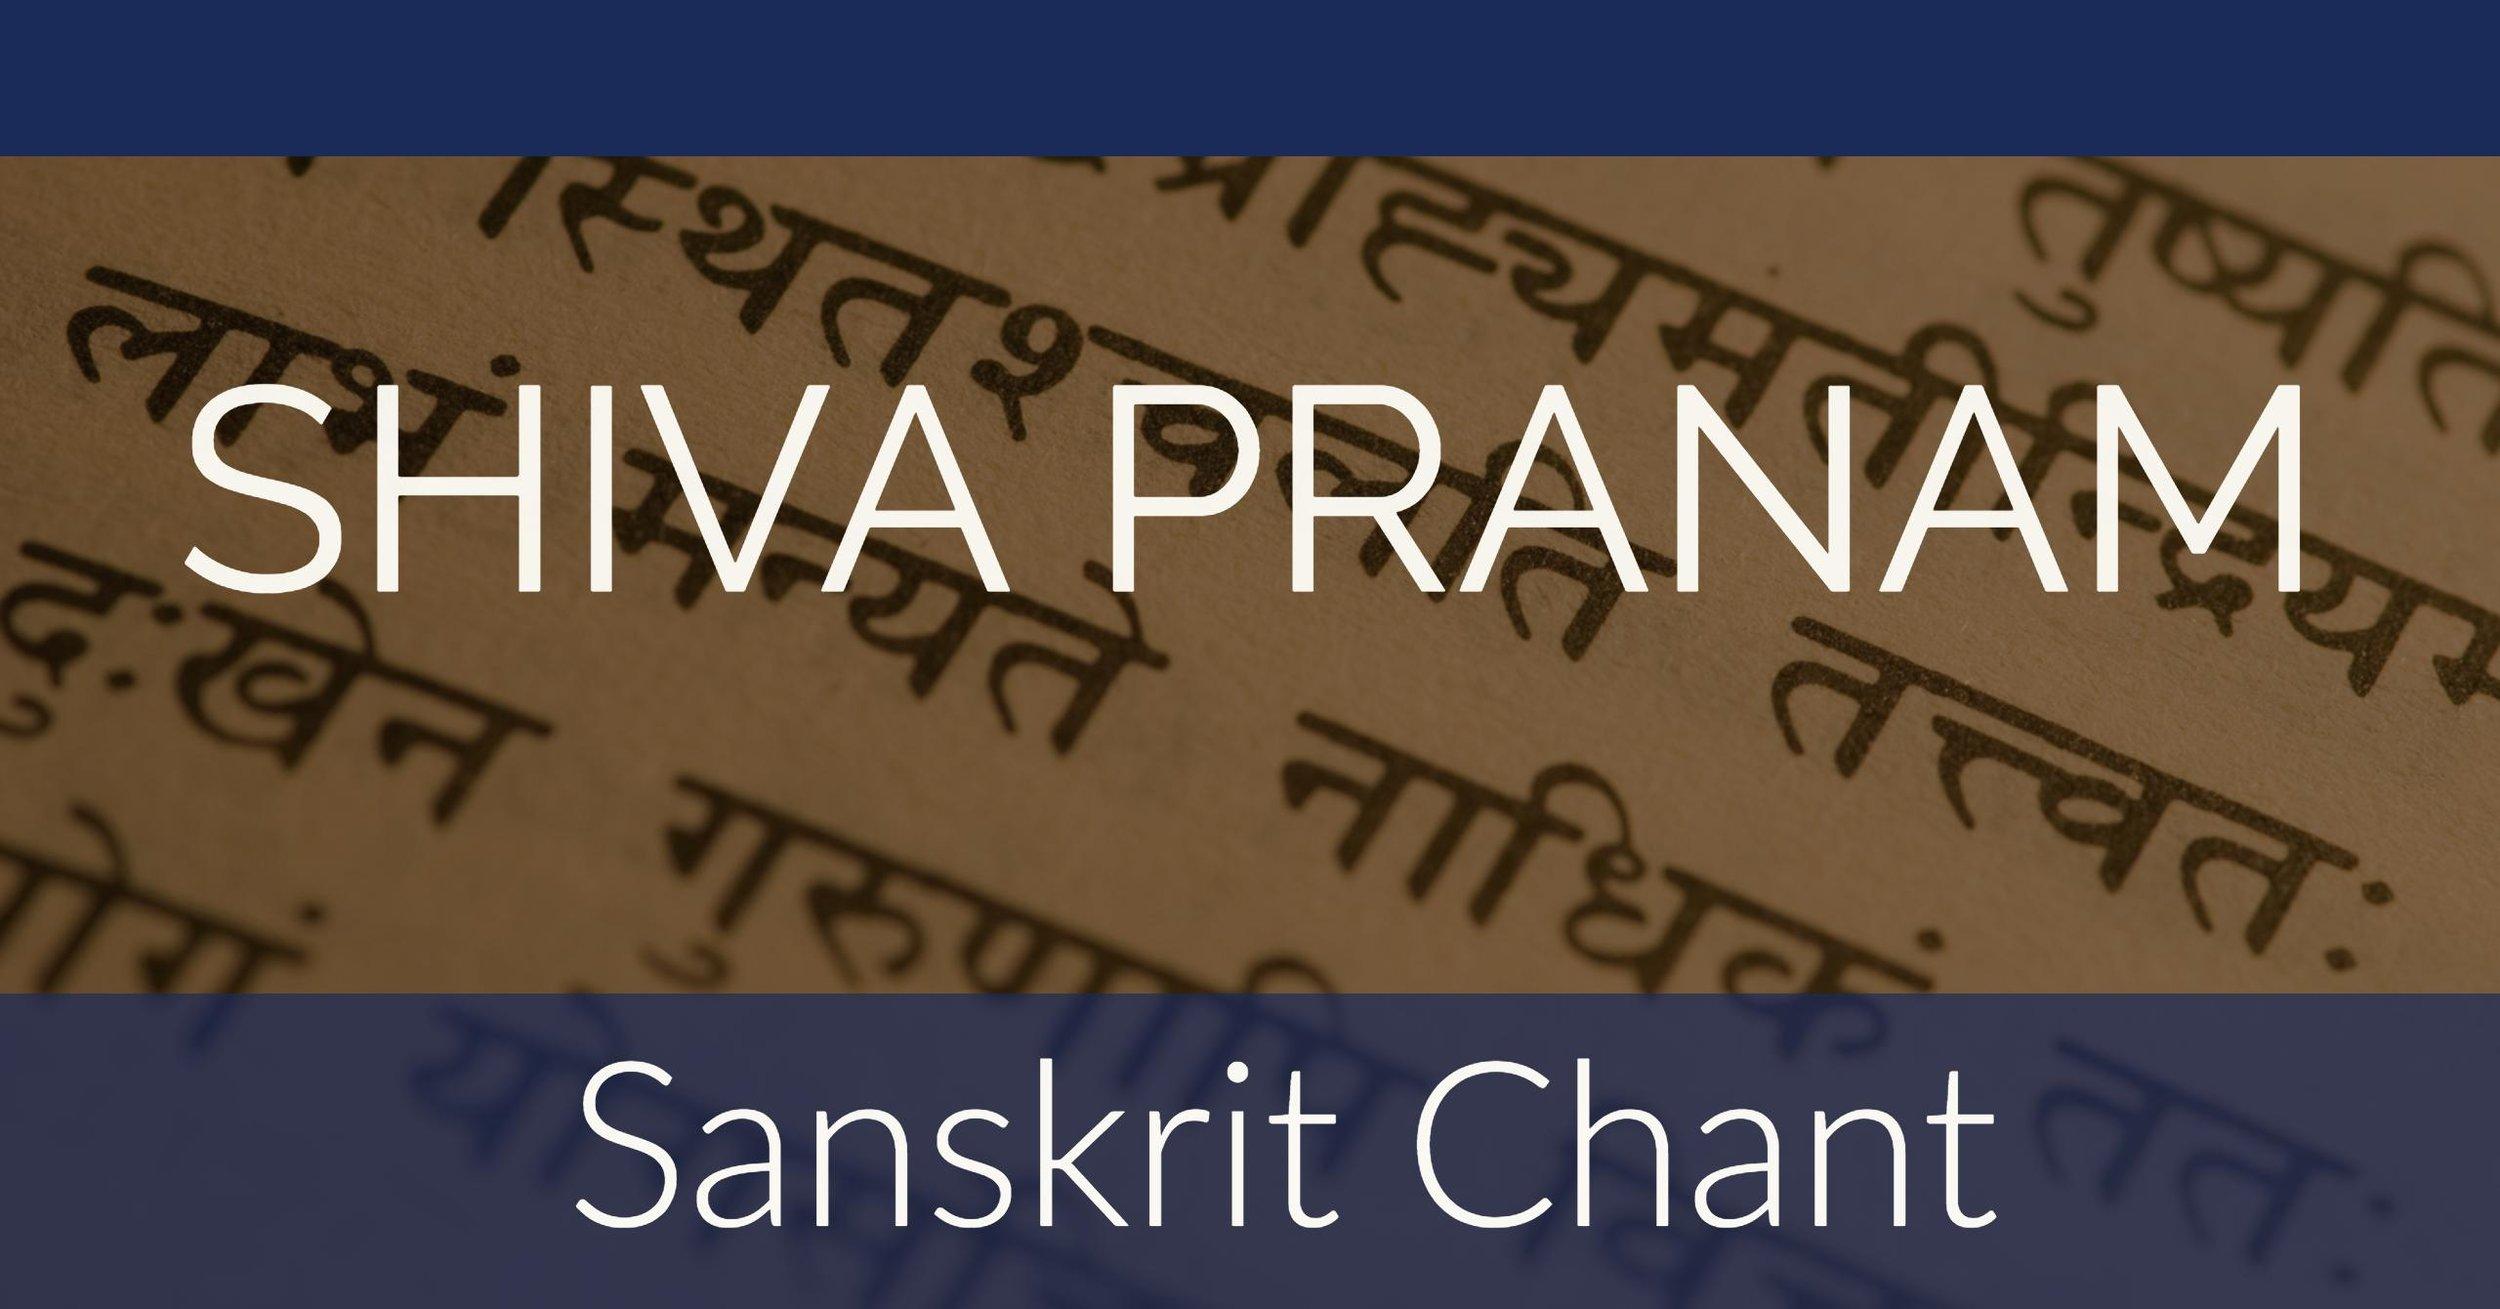 Course Card Shiva Pranam.jpg